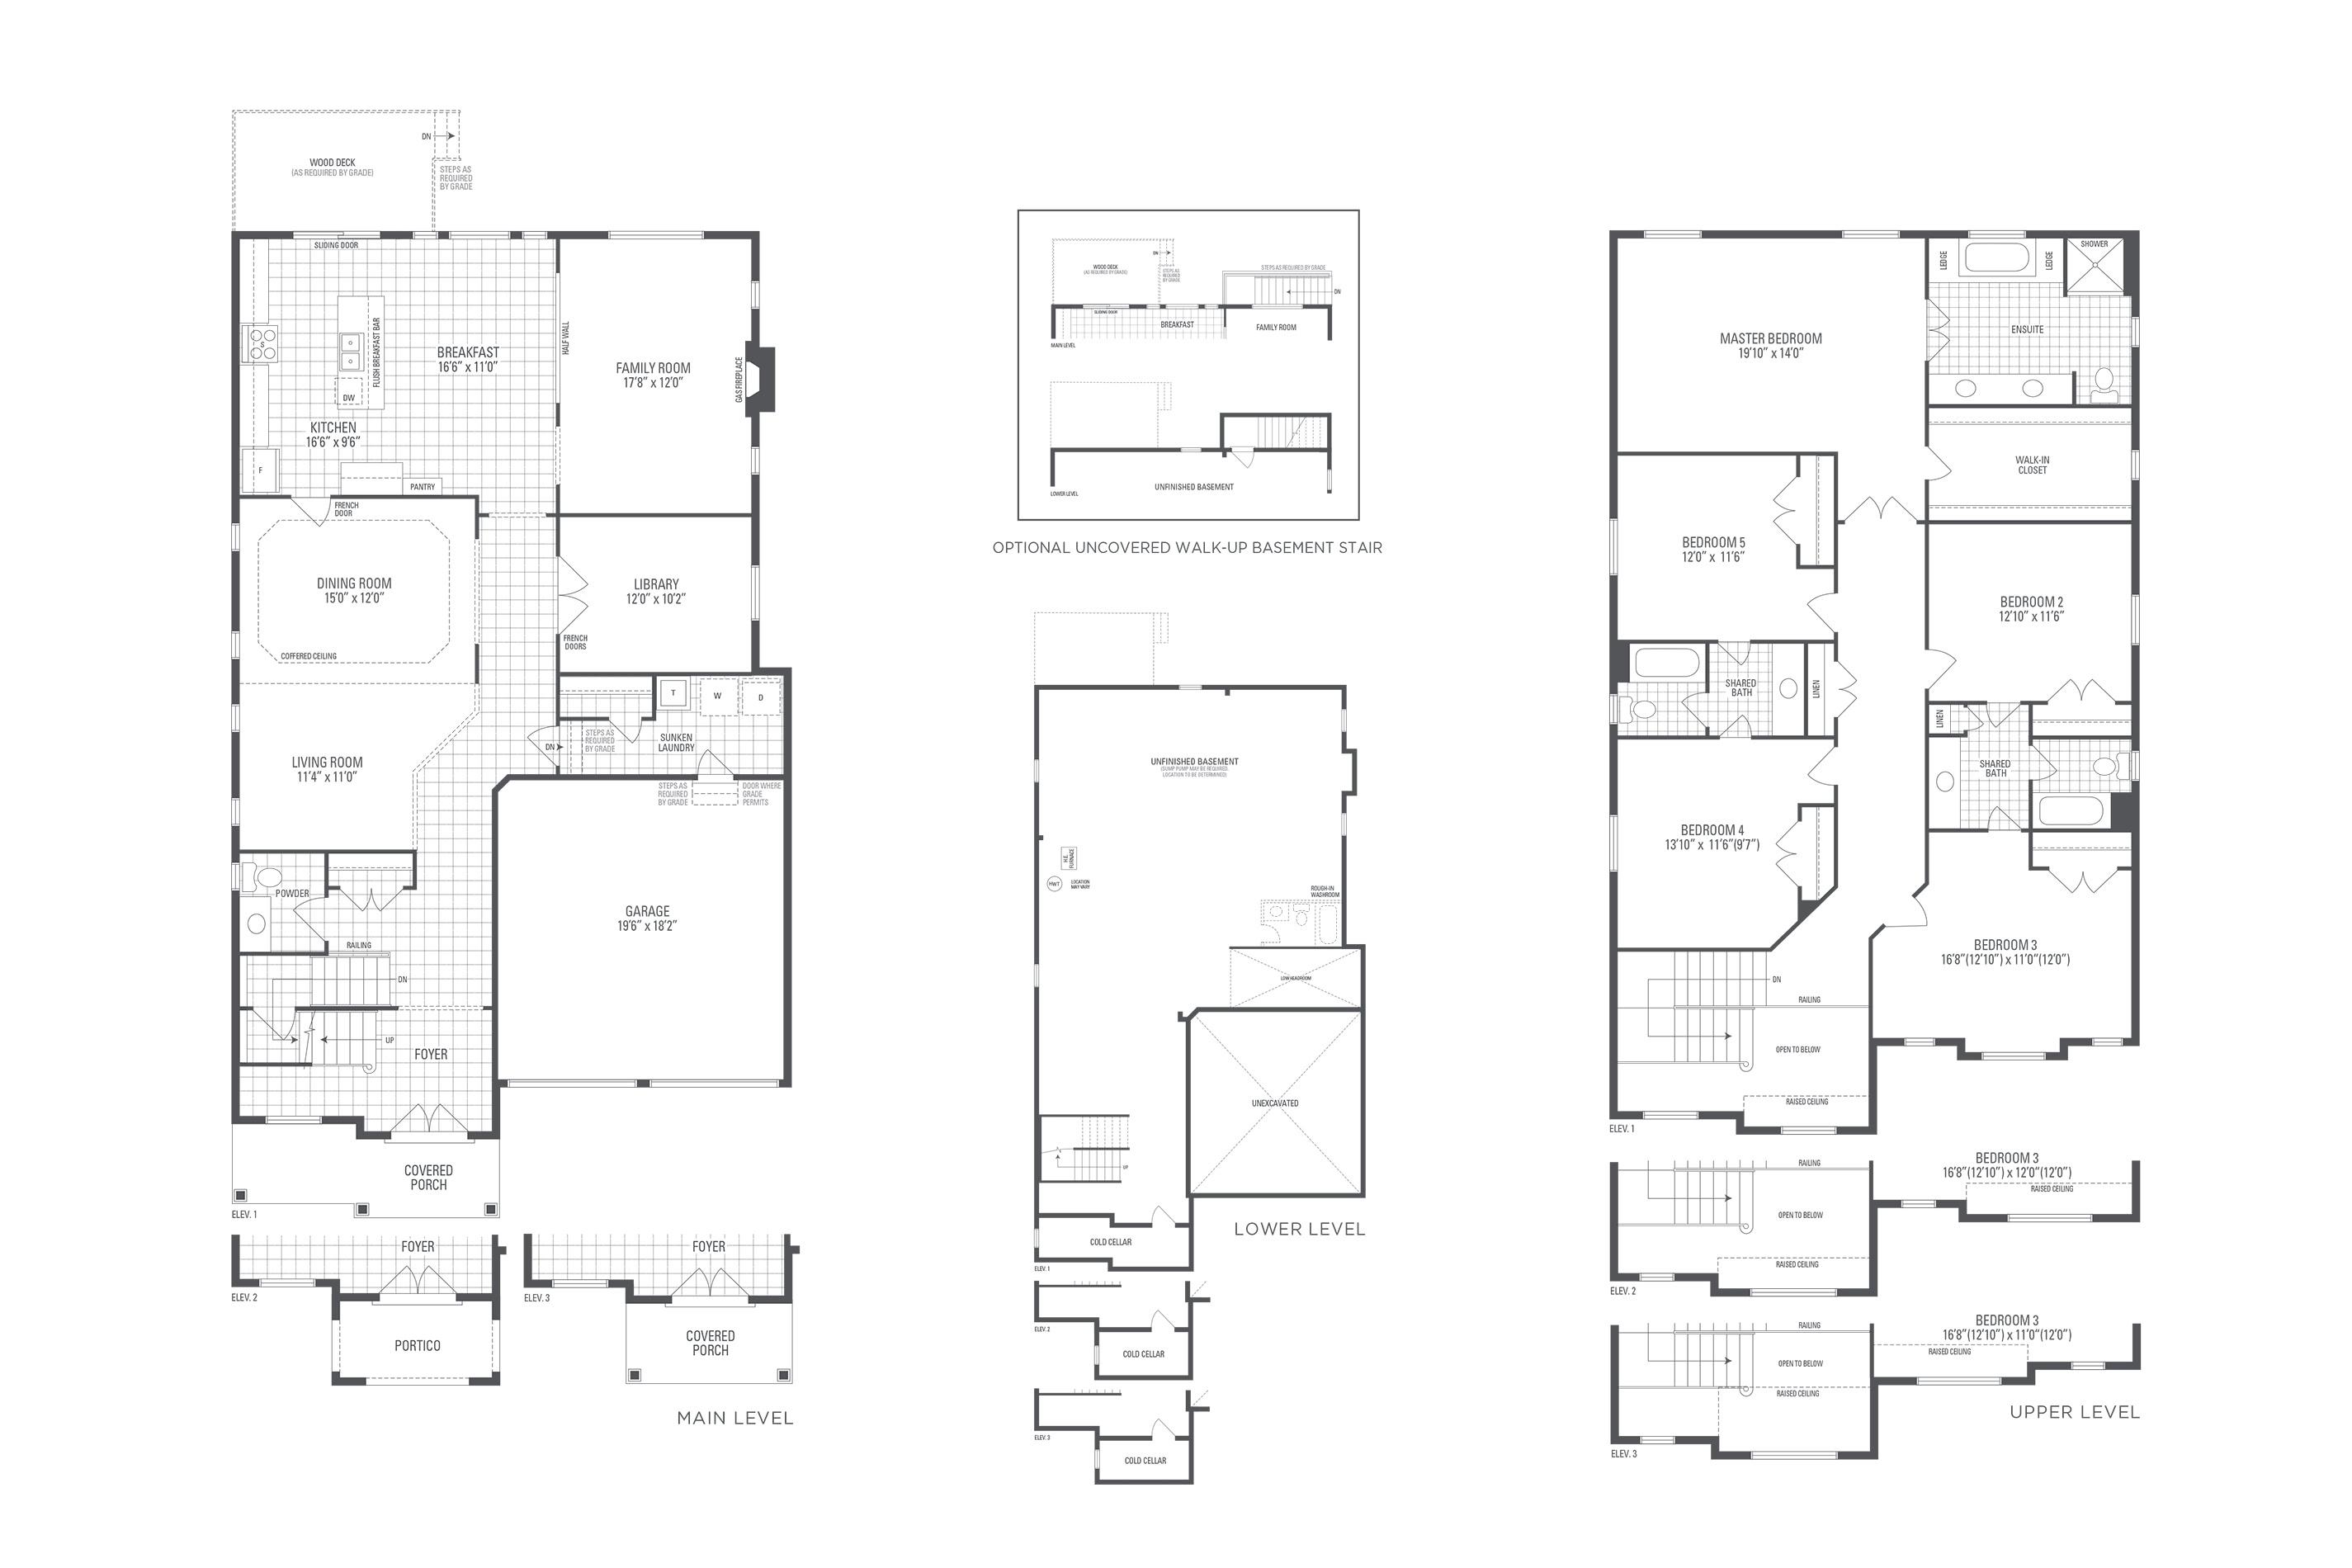 Spencer 04 Elev. 2 Floorplan Thumbnail